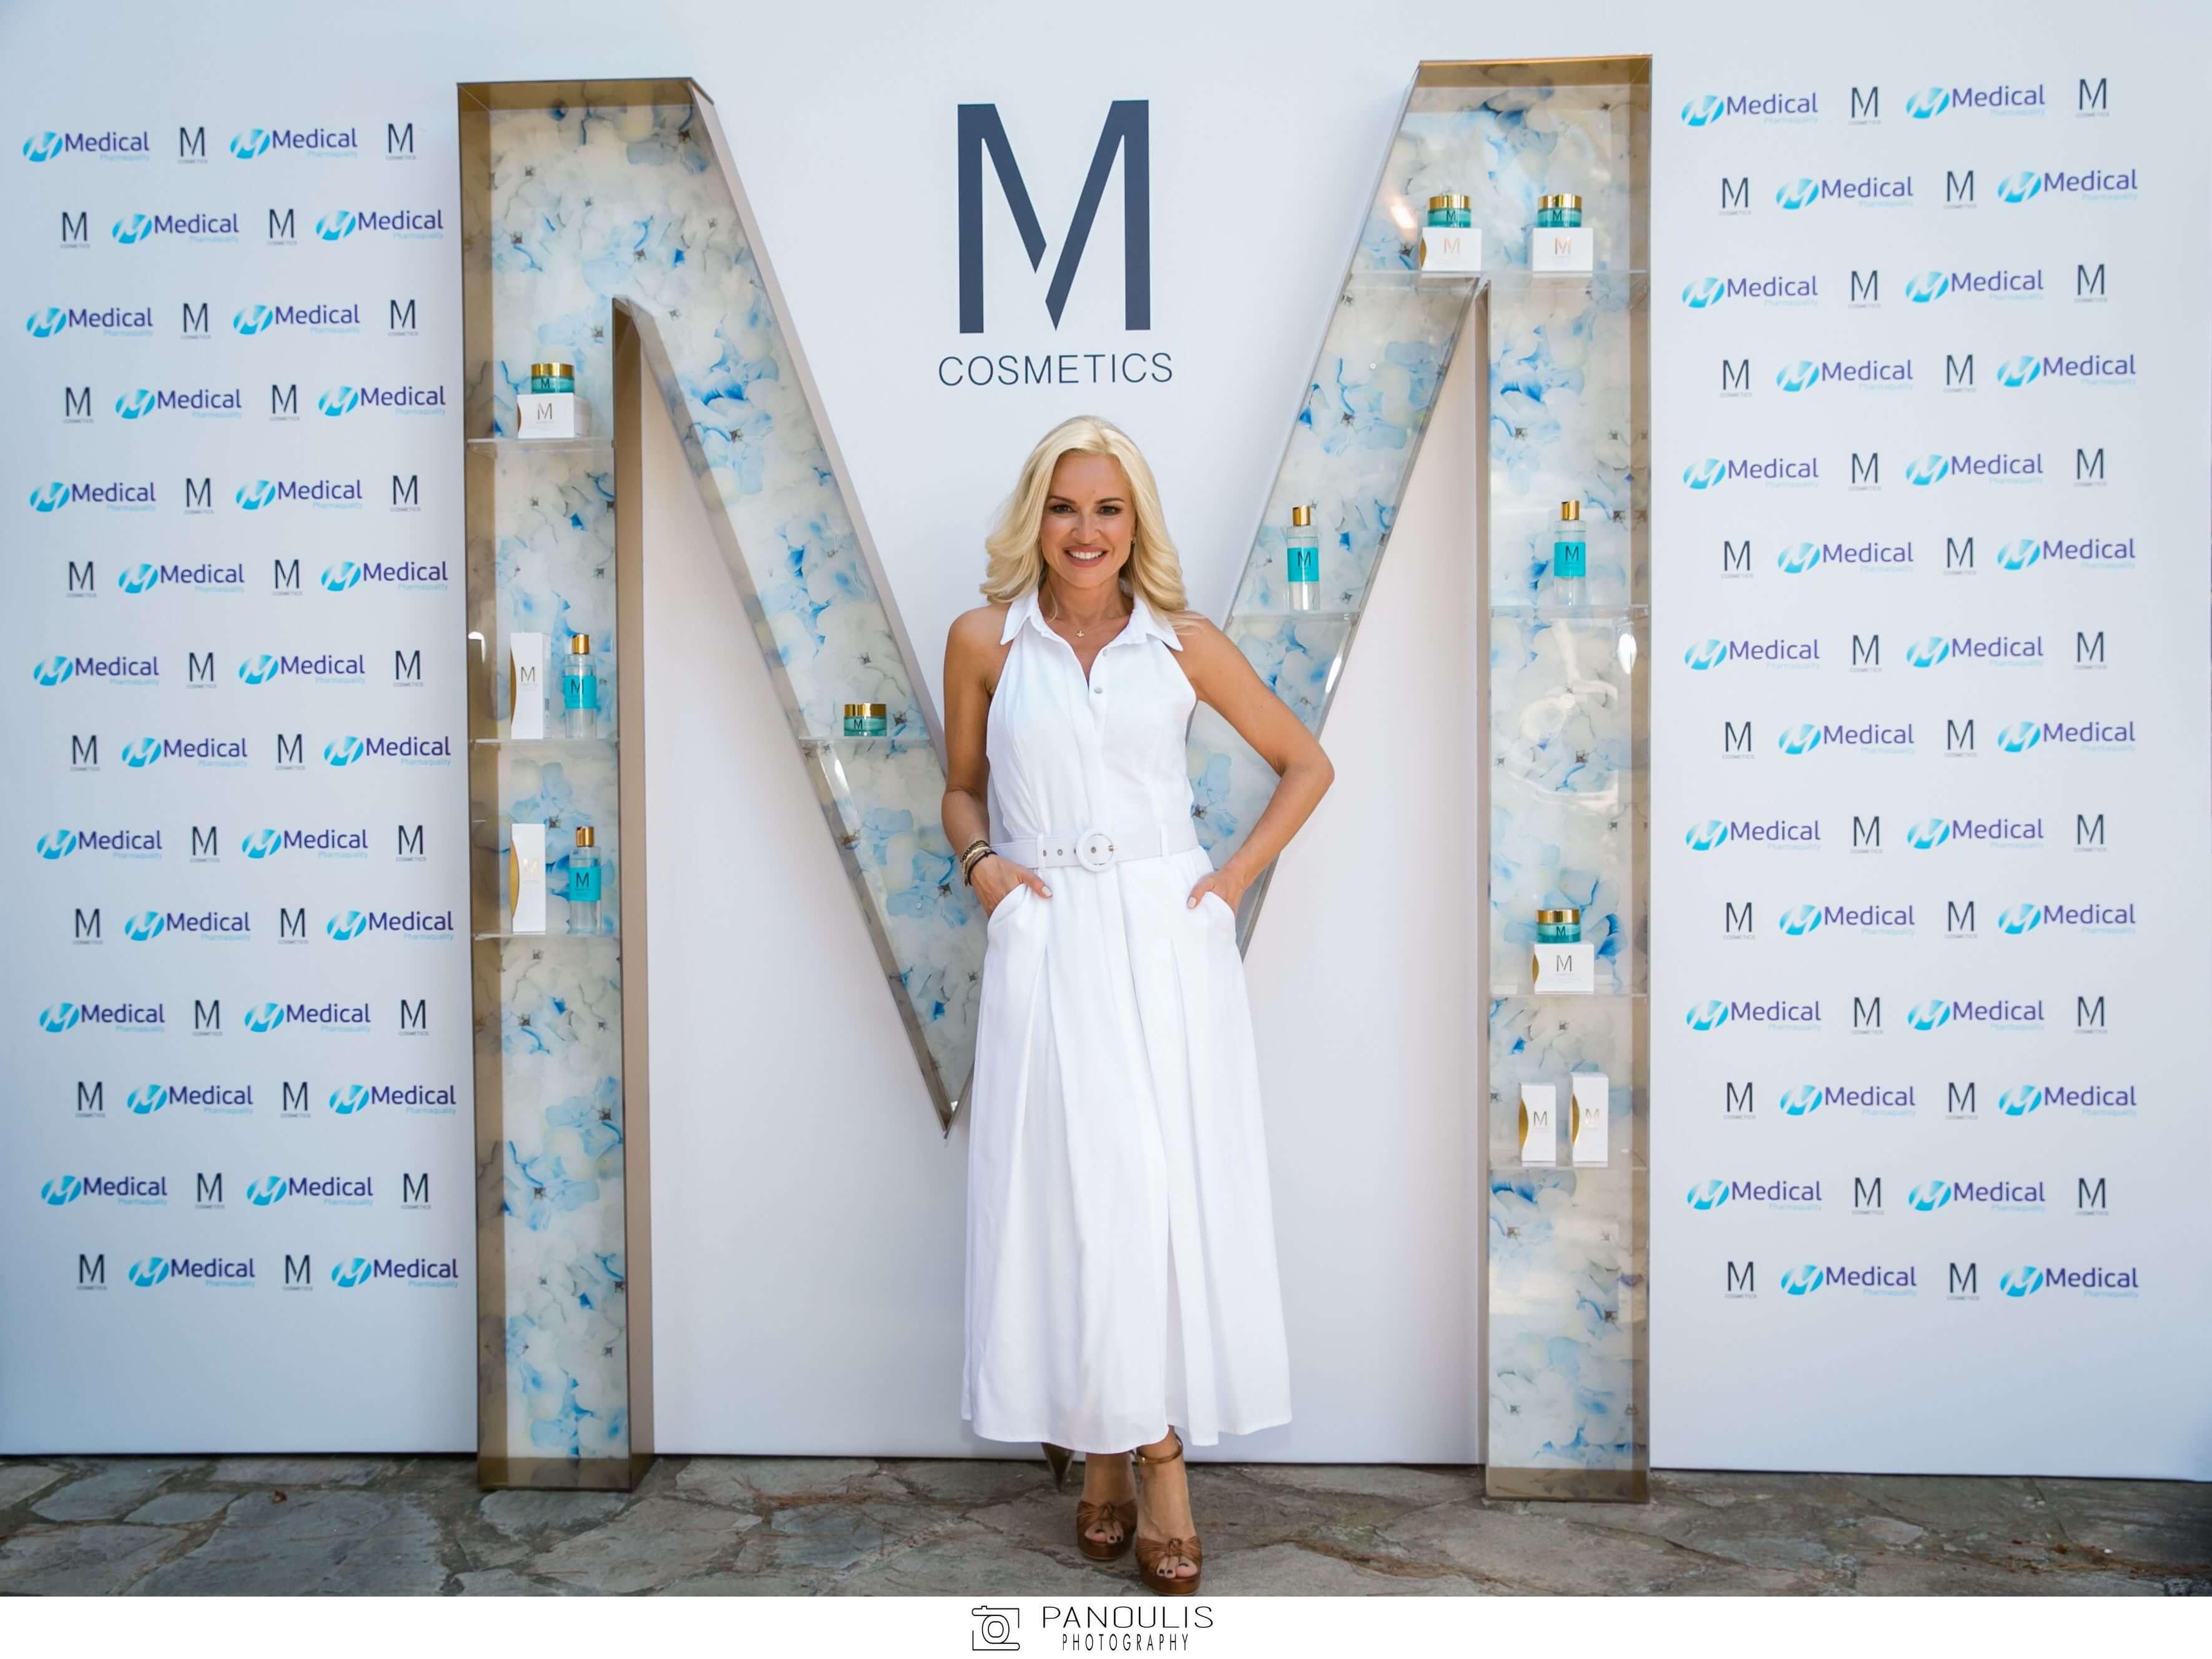 M Cosmetics από την Μαρία Μπεκατώρου!